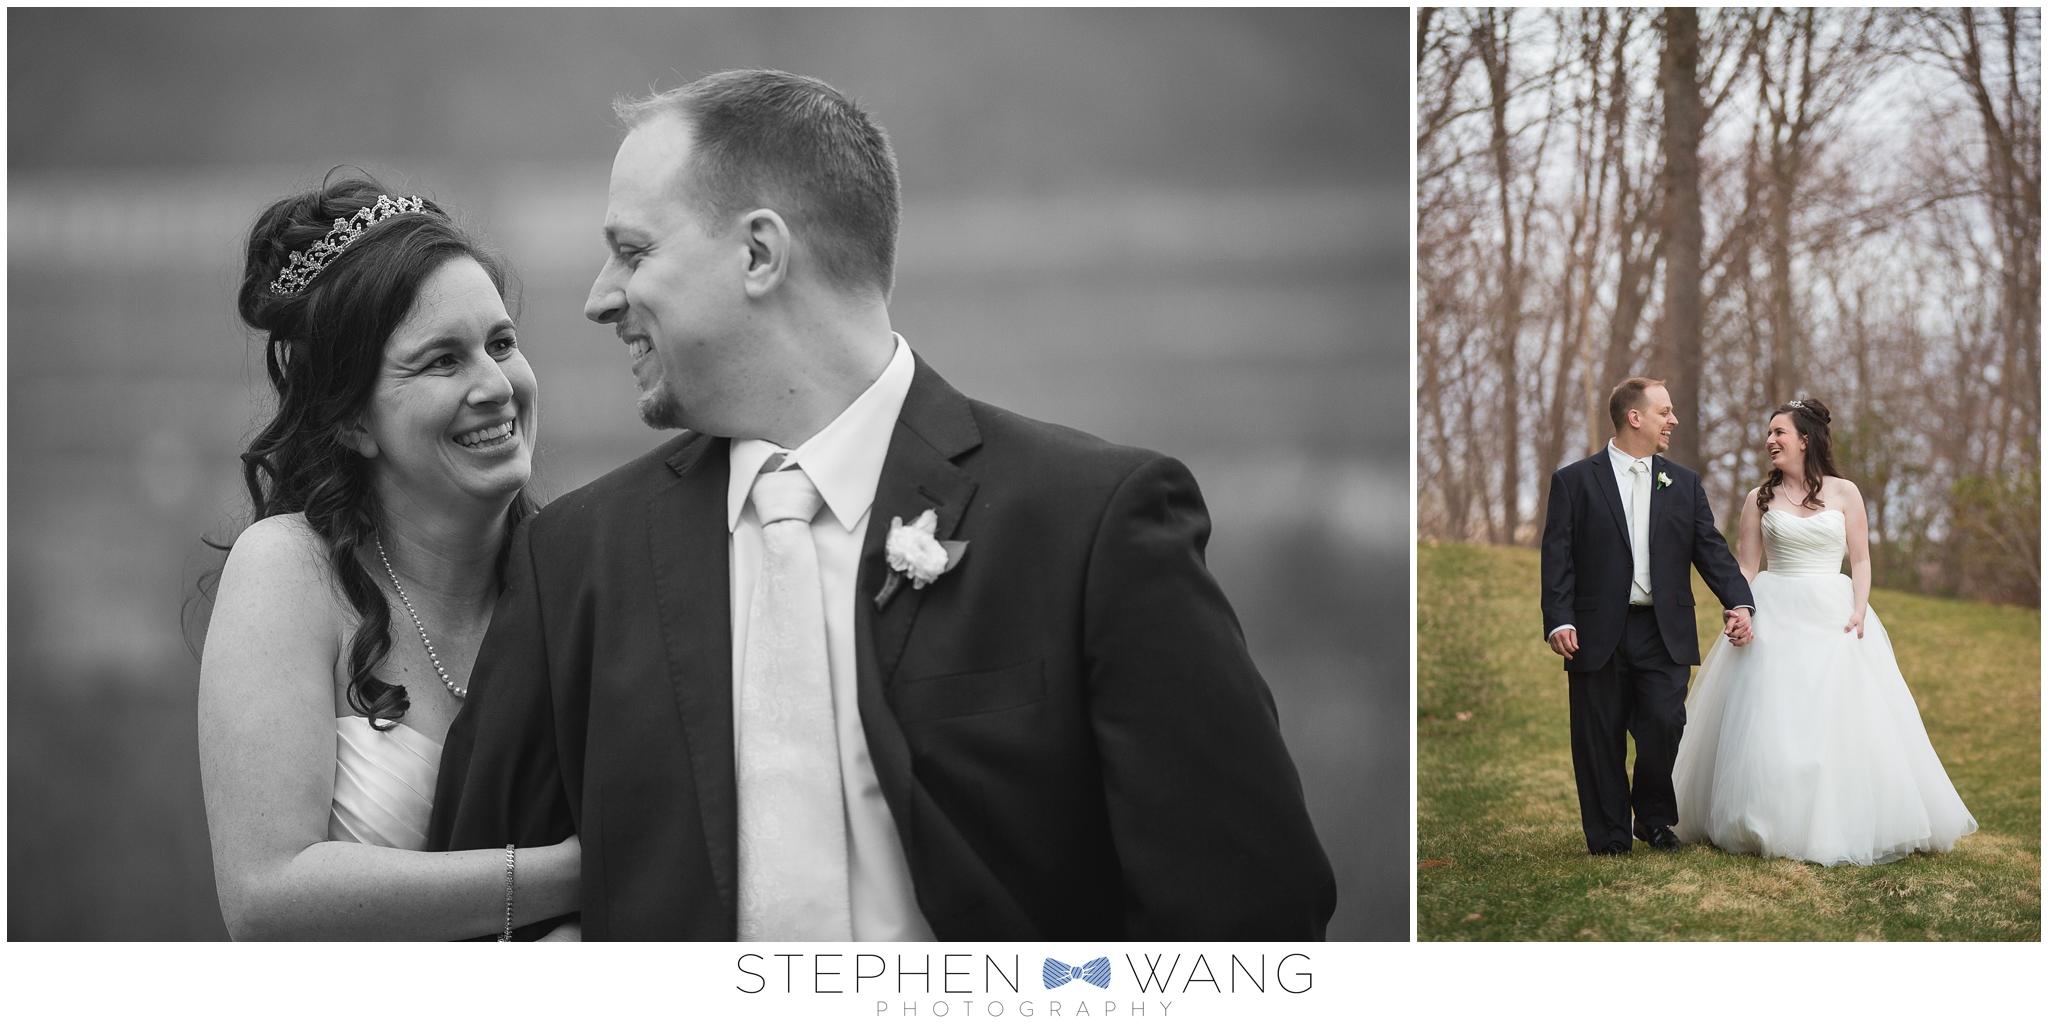 Stephen Wang Photography Wedding Photographer Connecticut CT-12-24_0008.jpg